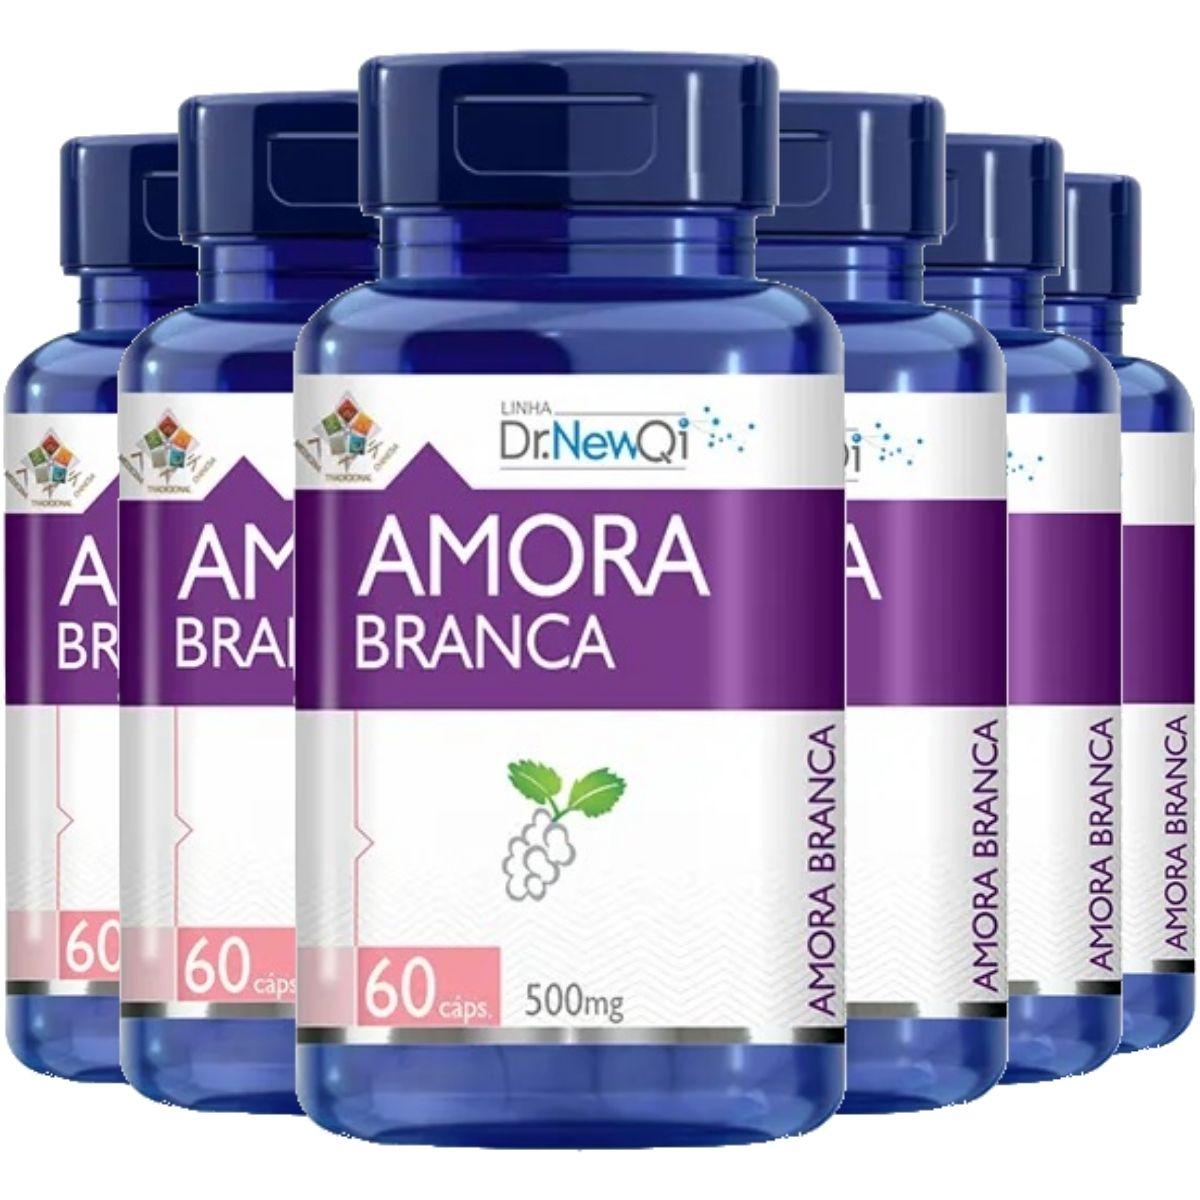 Kit 6 Amora Branca Vitaminas e Minerais 60 Cápsulas 500mg Dr. New Qi - Upnutri